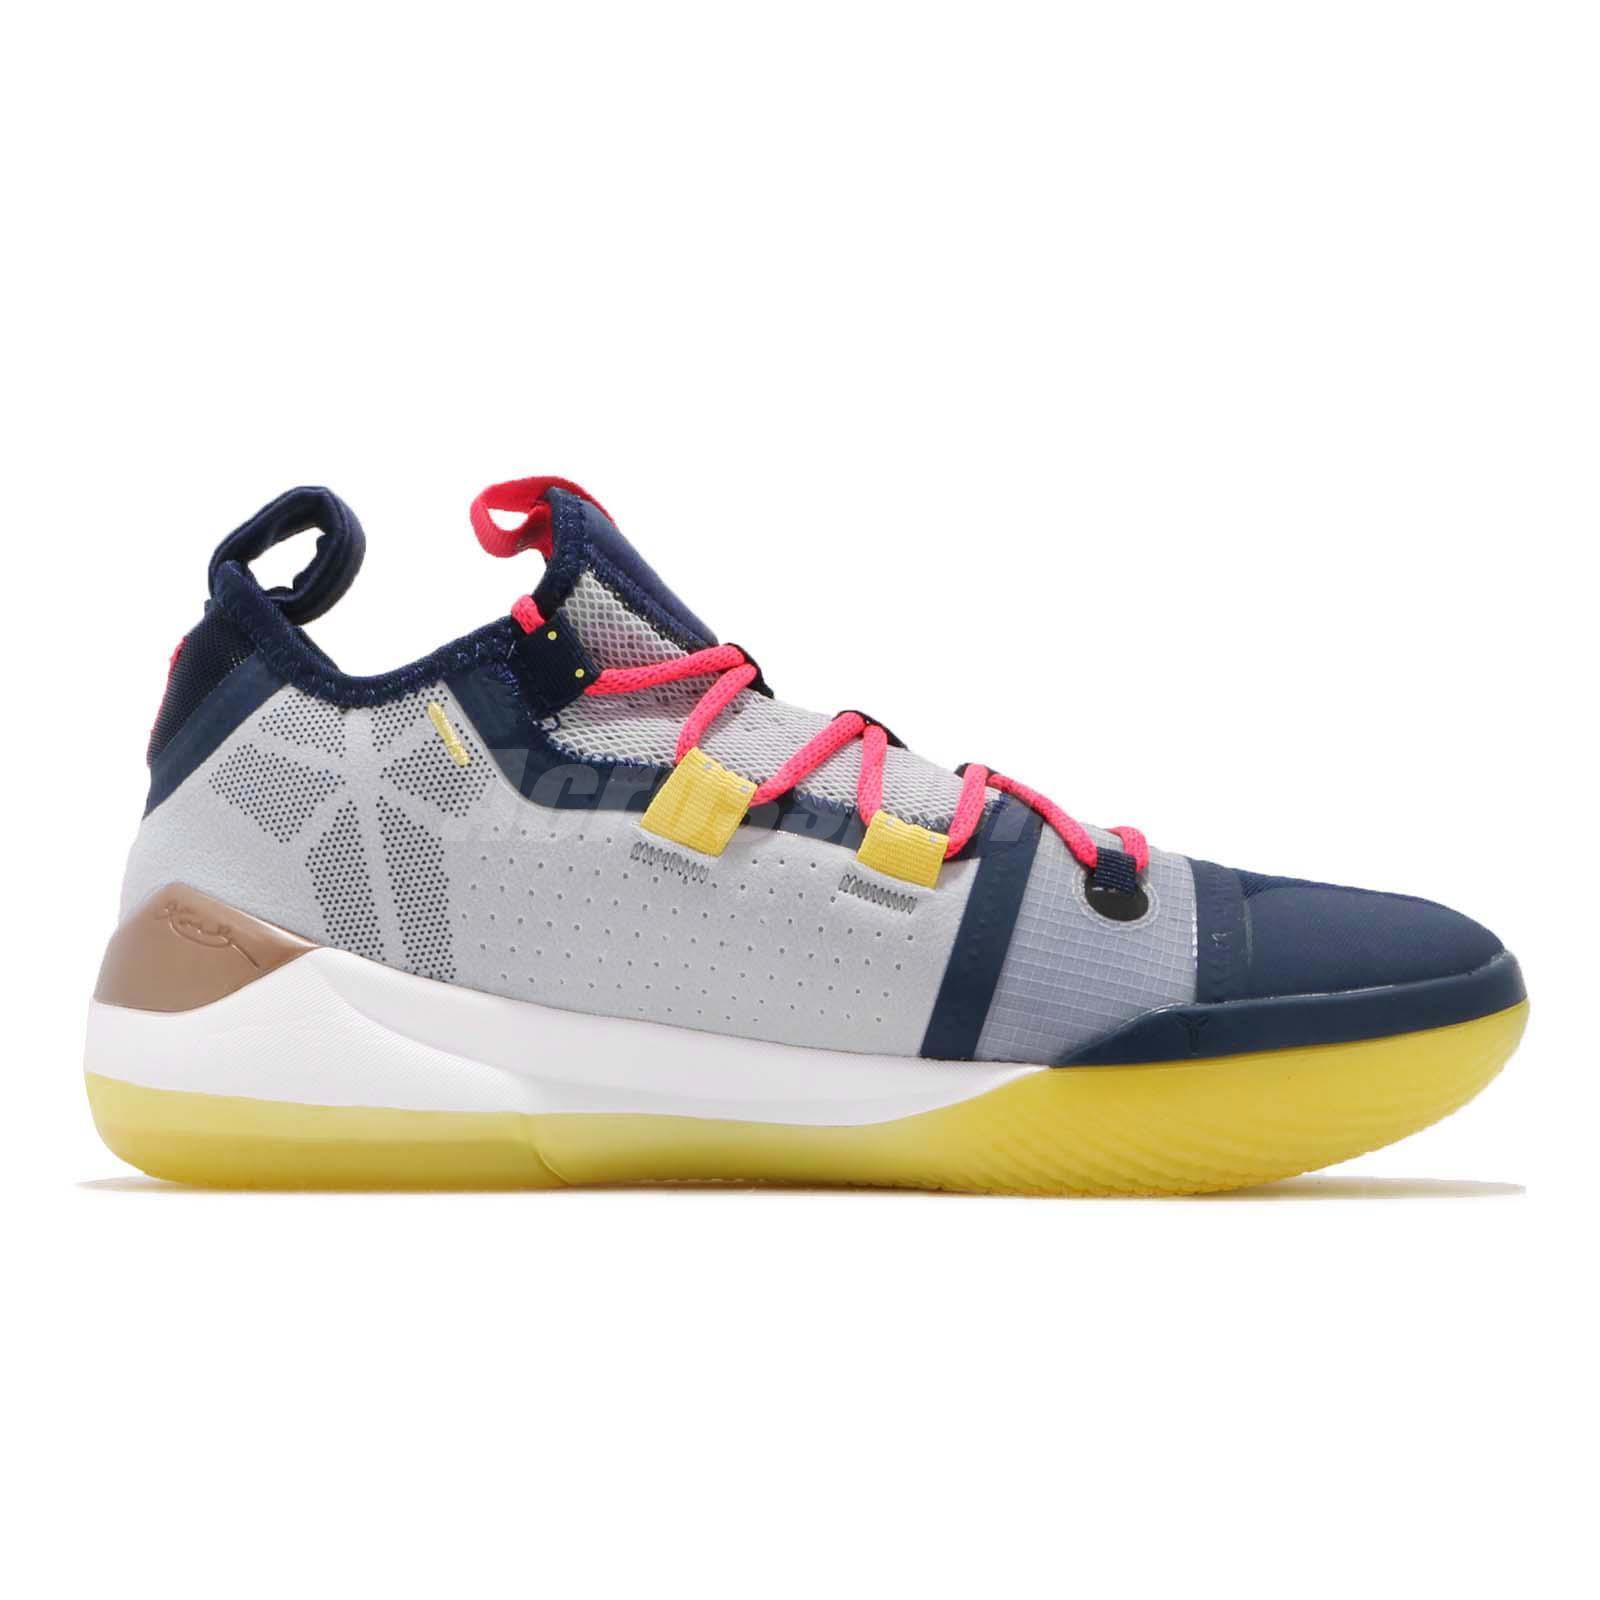 3e36c59ae2e18e Nike KOBE AD Mamba Day A.D. EP Sail Multi-Color Mens Basketball ...